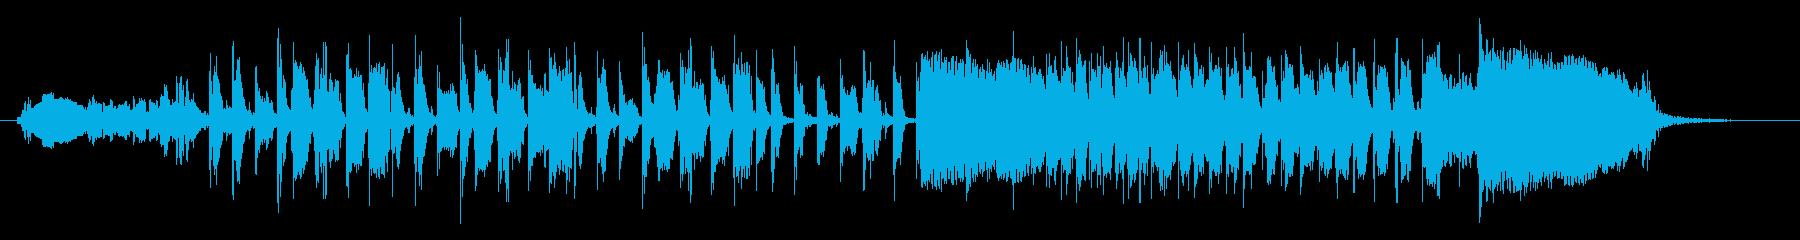 Funk風短いオープニングの再生済みの波形